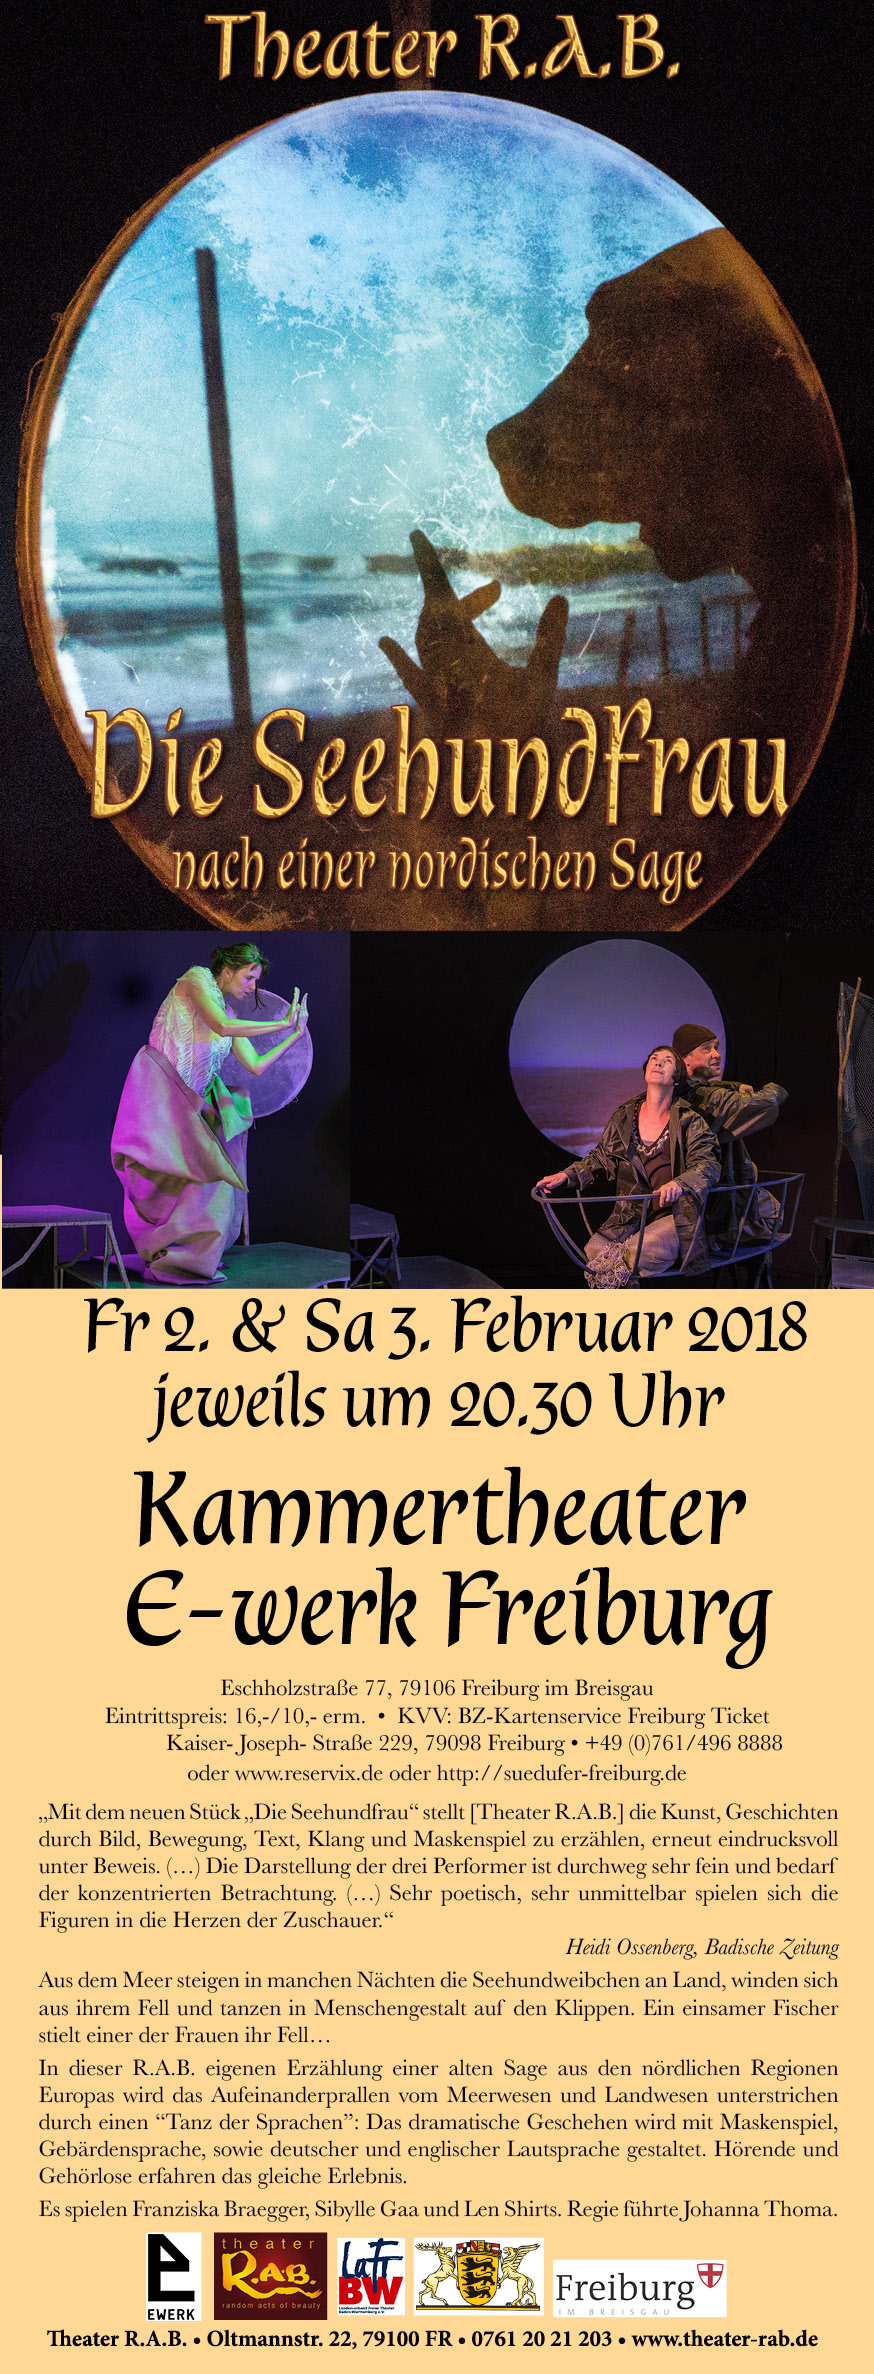 [cml_media_alt id='1526']RAB Seehundfrau Flyer Ewerk 18[/cml_media_alt]